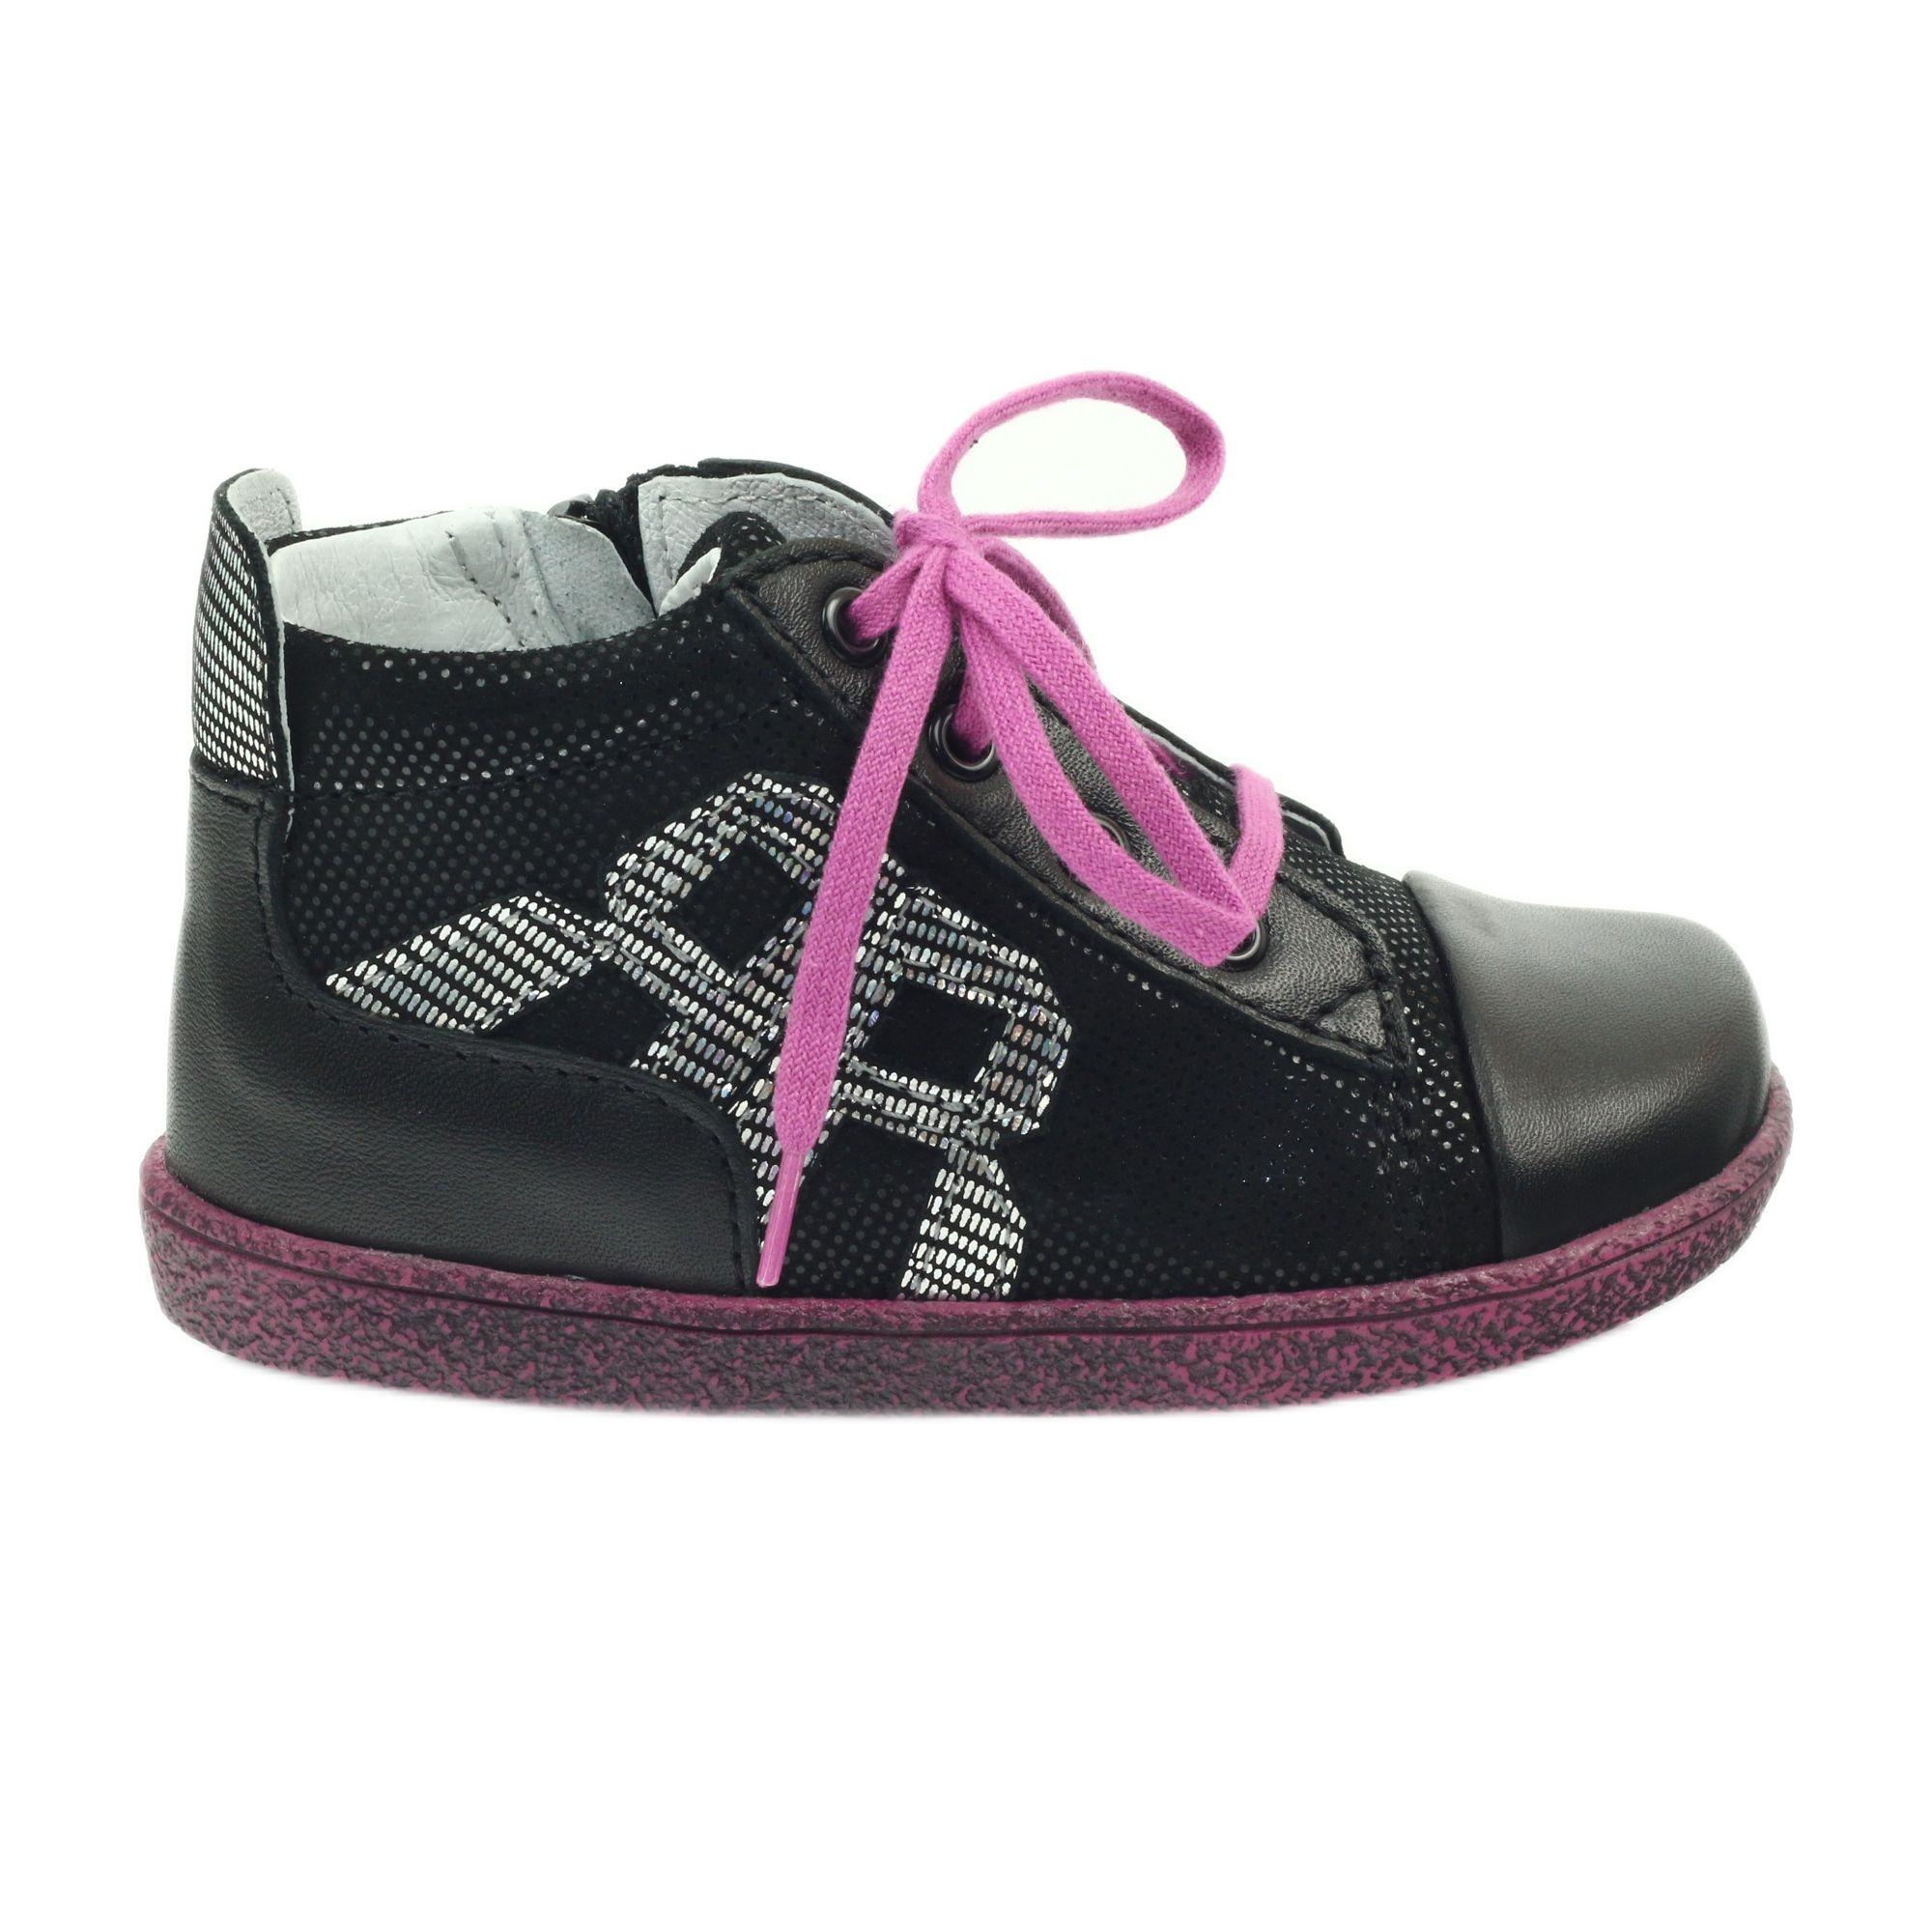 Polbuty Silpro Ren But 1501 Czarne Rozowe Childrens Shoes Girls Shoes Kid Shoes